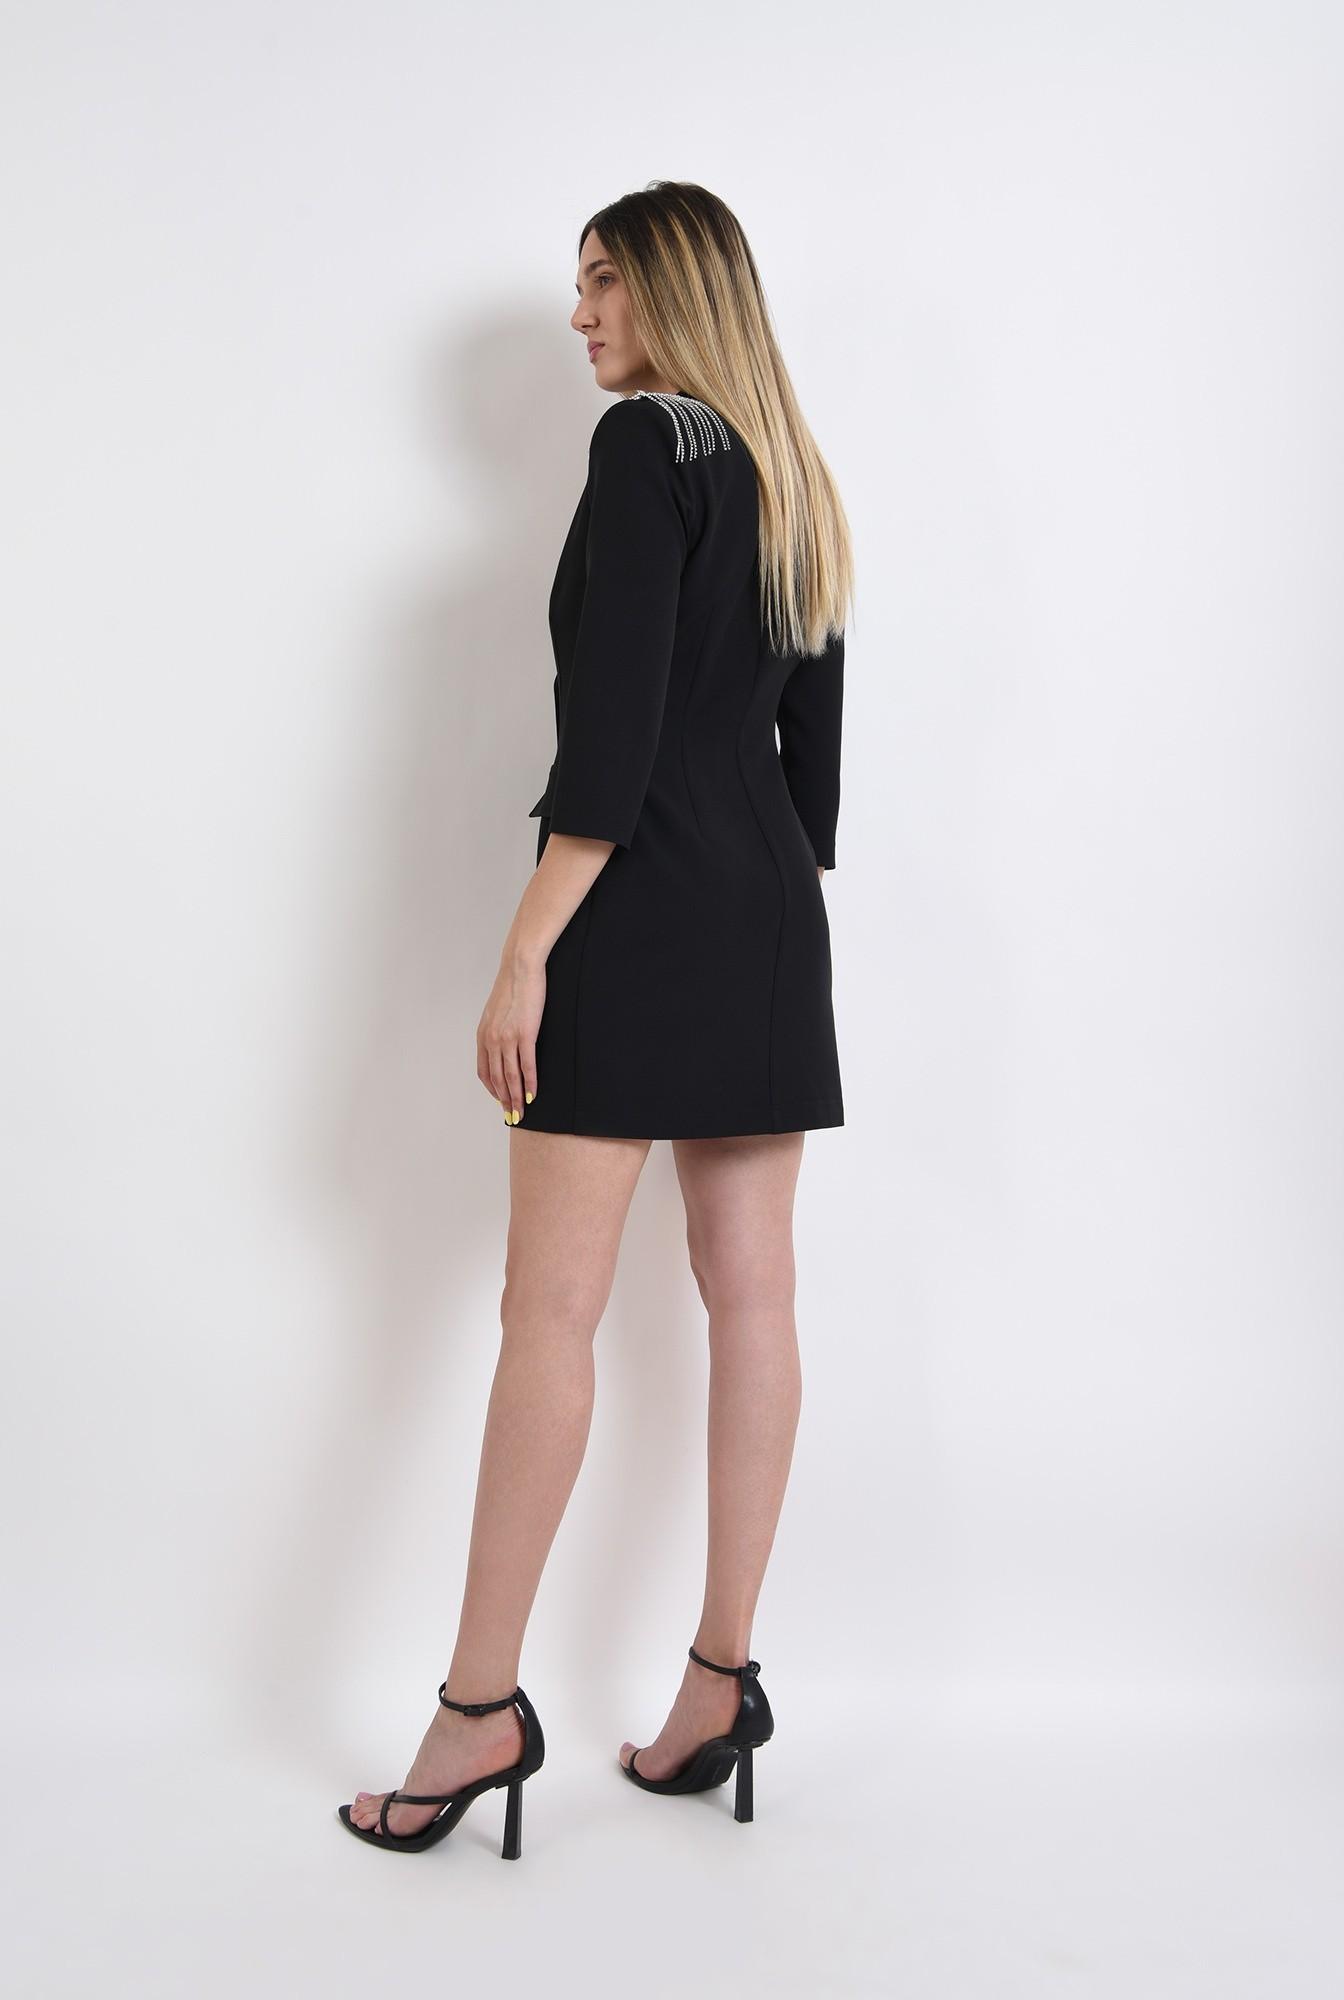 0 - rochie neagra, stil sacou, cu nasturi metalici